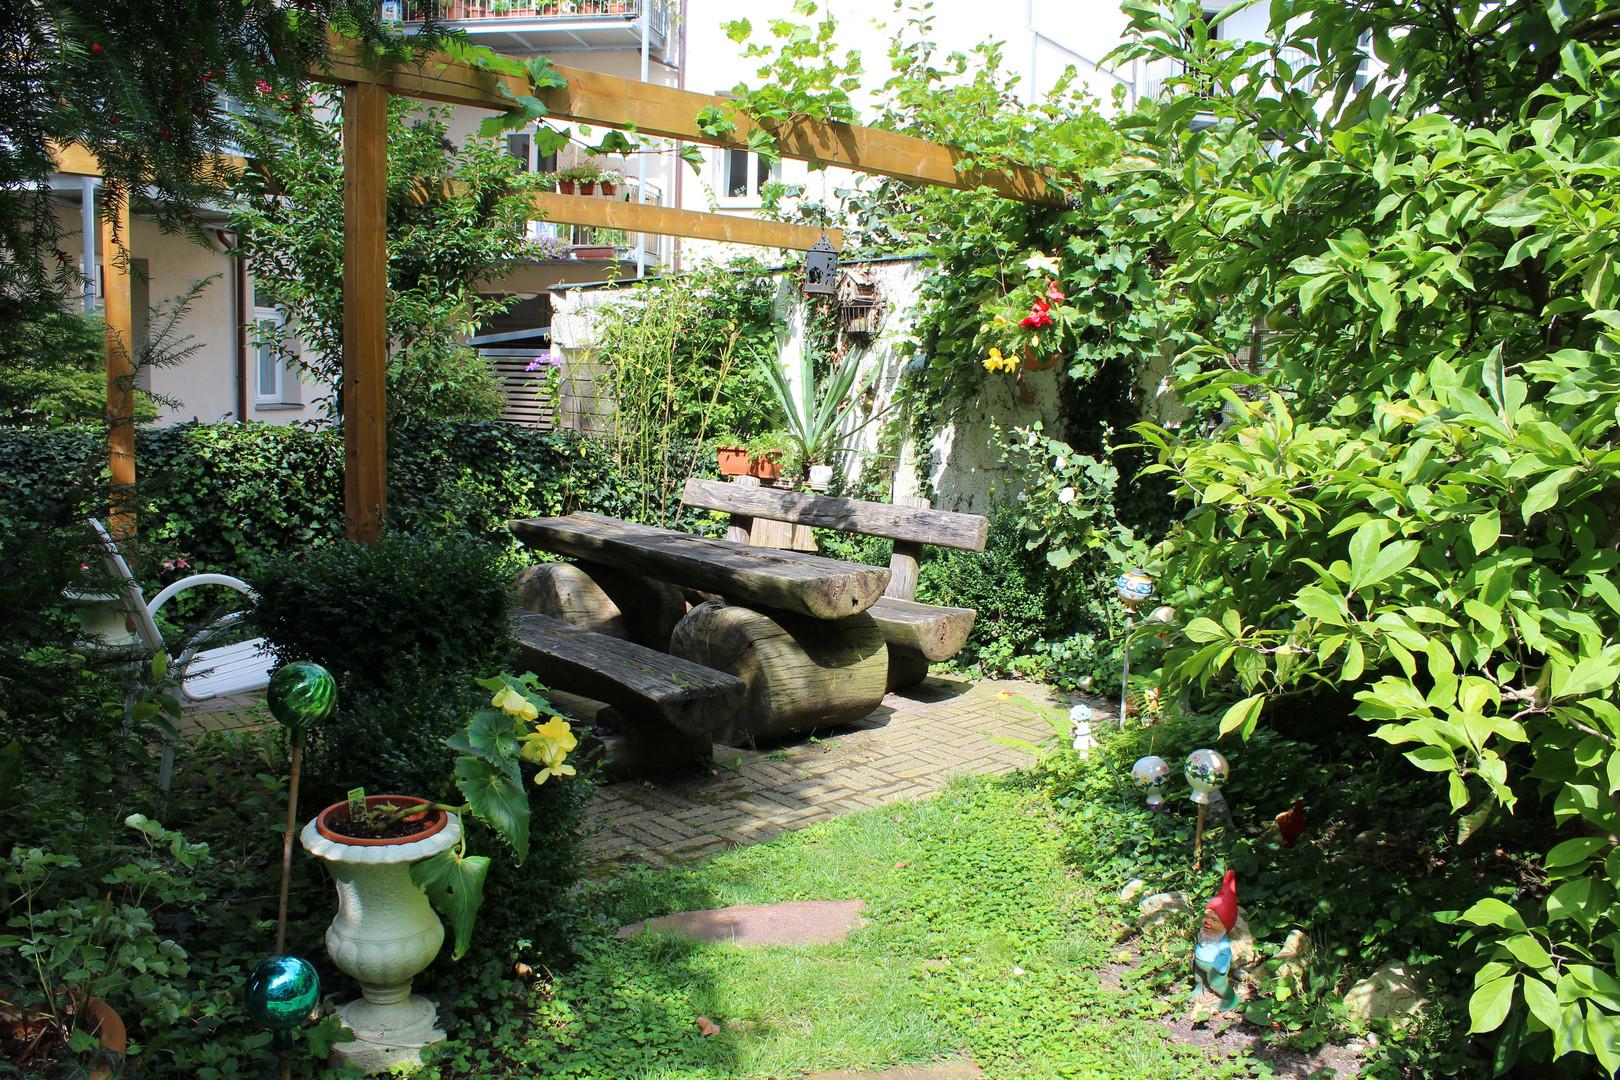 Garten sitzecke foto bild landschaft lebensr ume - Garten sitzecke ...